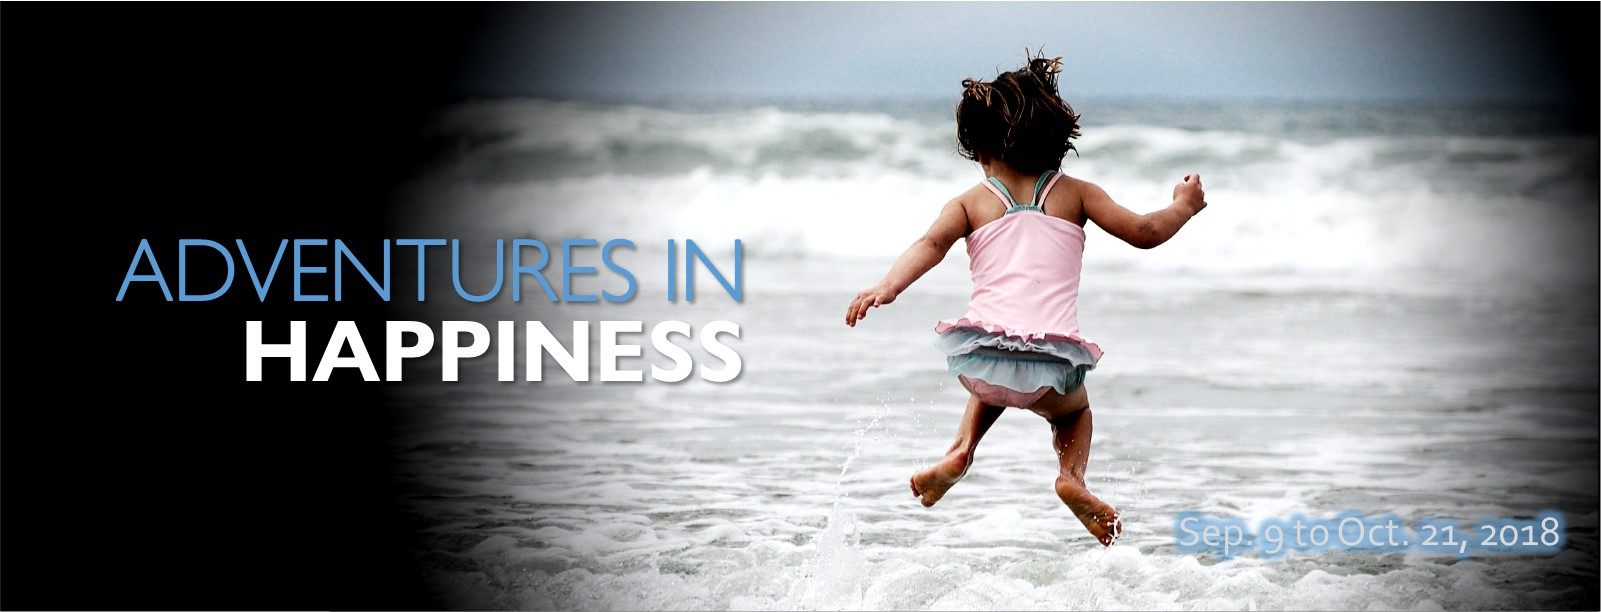 Happiness Through Purpose Image